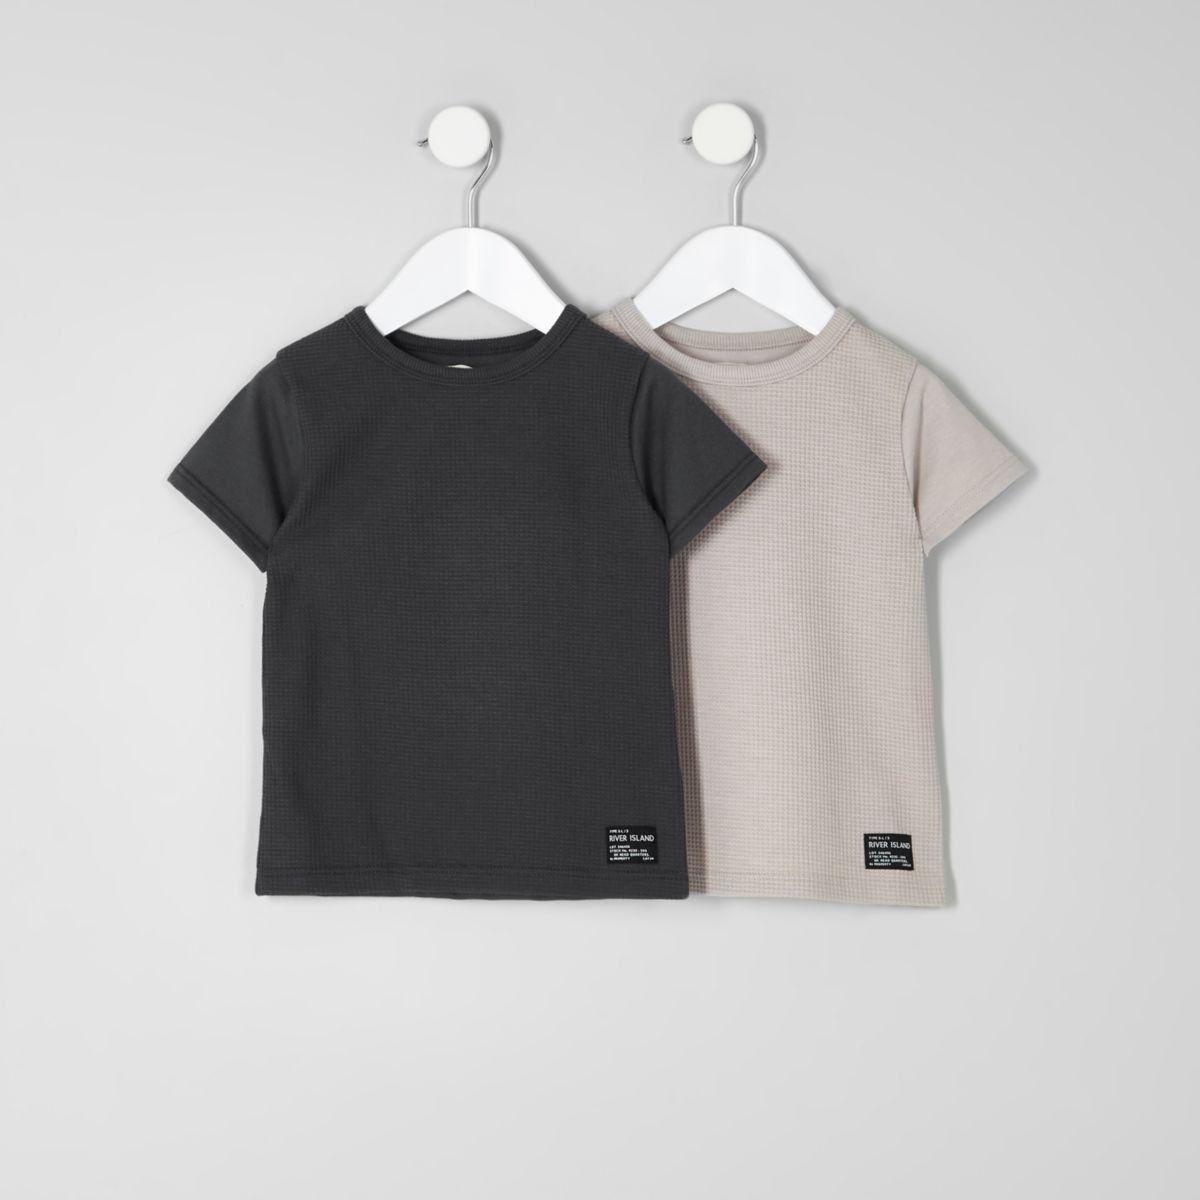 Mini boys grey and stone T-shirt multipack